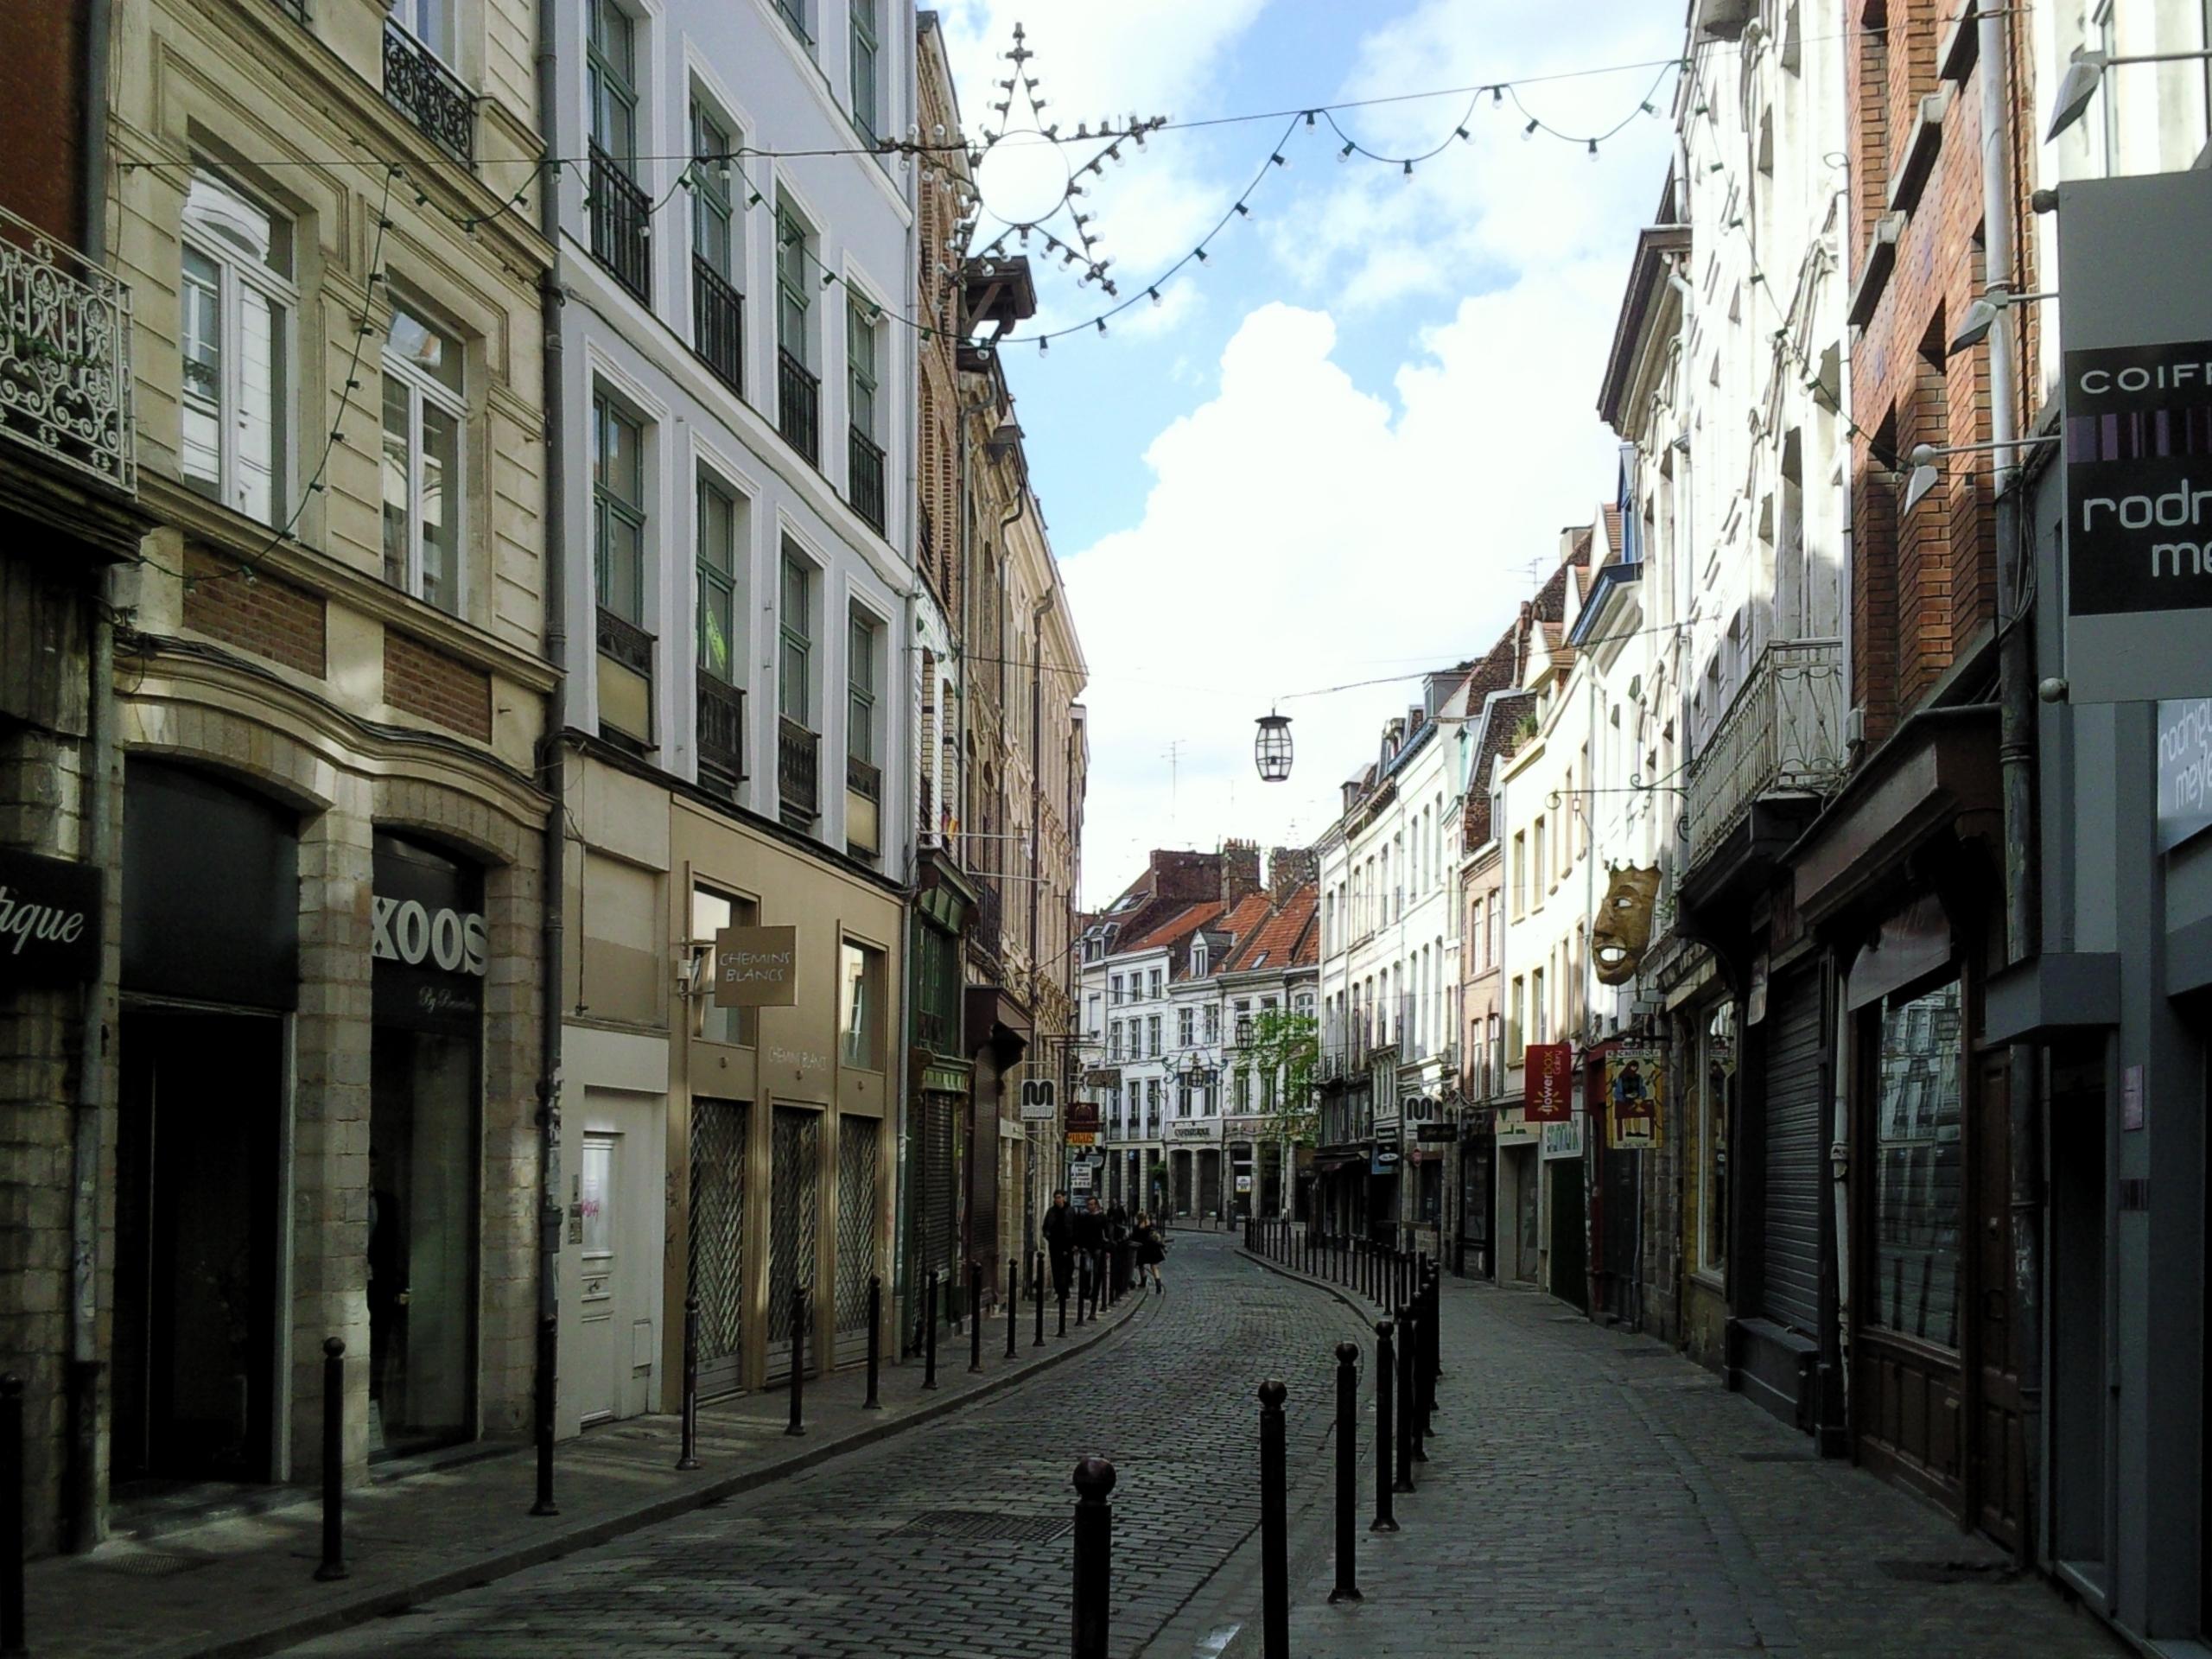 File:Lille rue de la clé.jpg - Wikimedia Commons